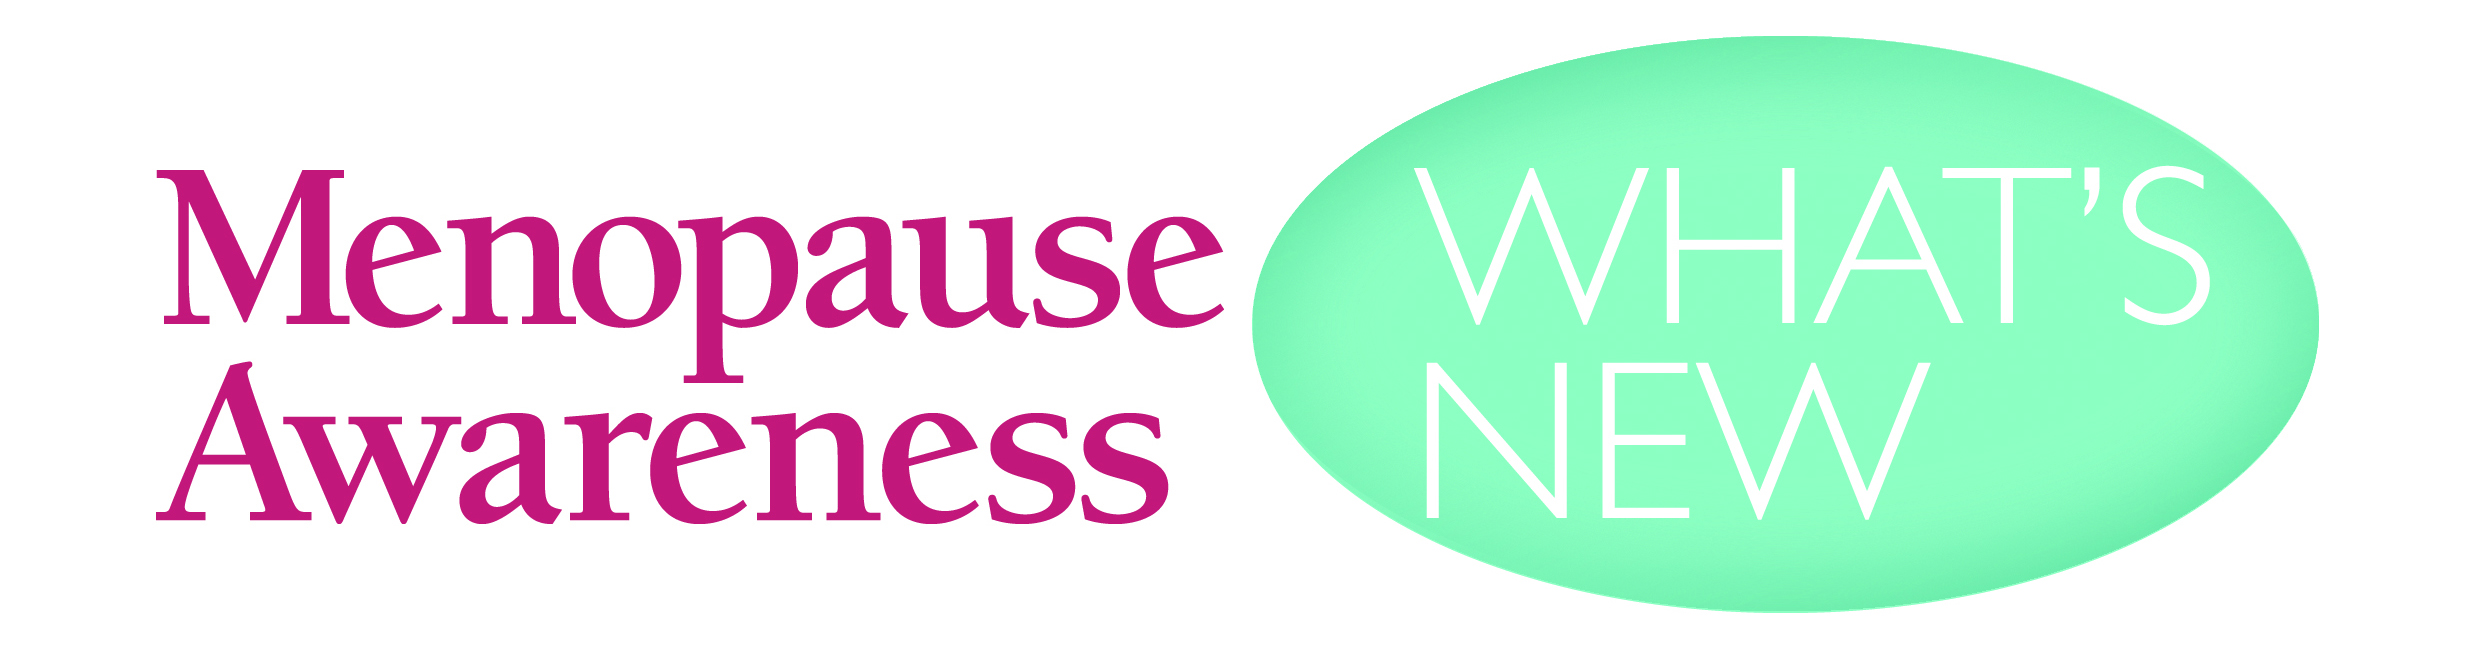 https://www.dxlink.ca/CJDX/2016/March/Menopause_Awareness_Timing.html